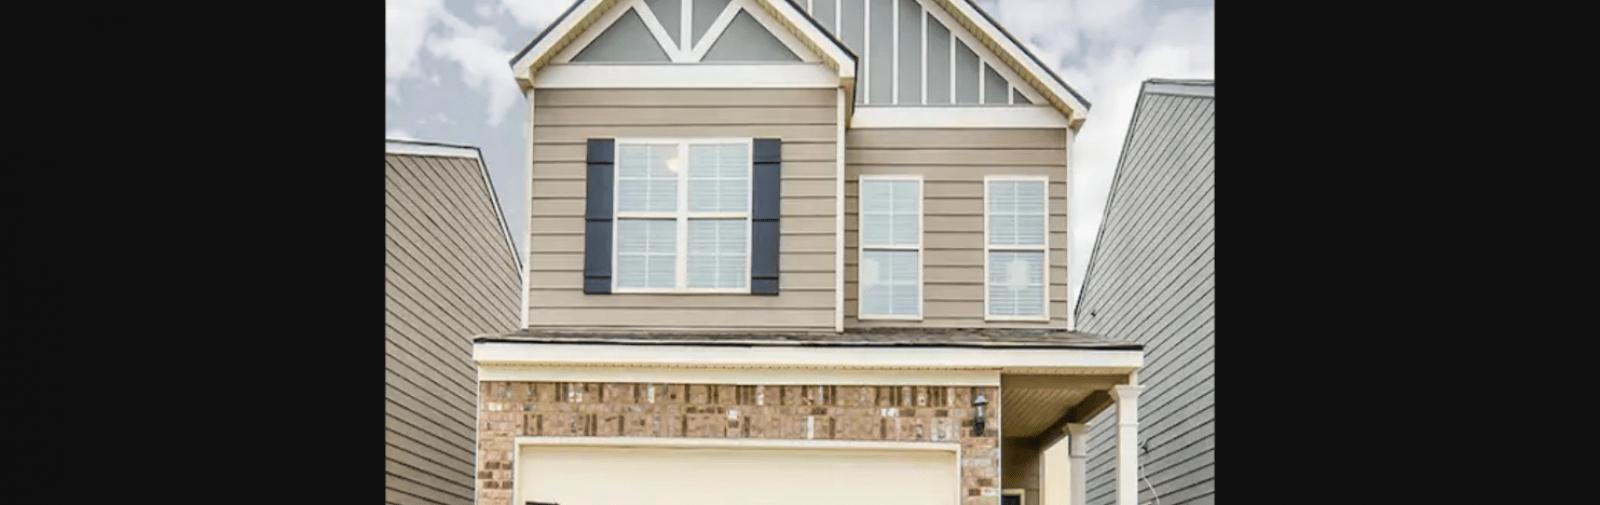 Fairburn Home - Executive II